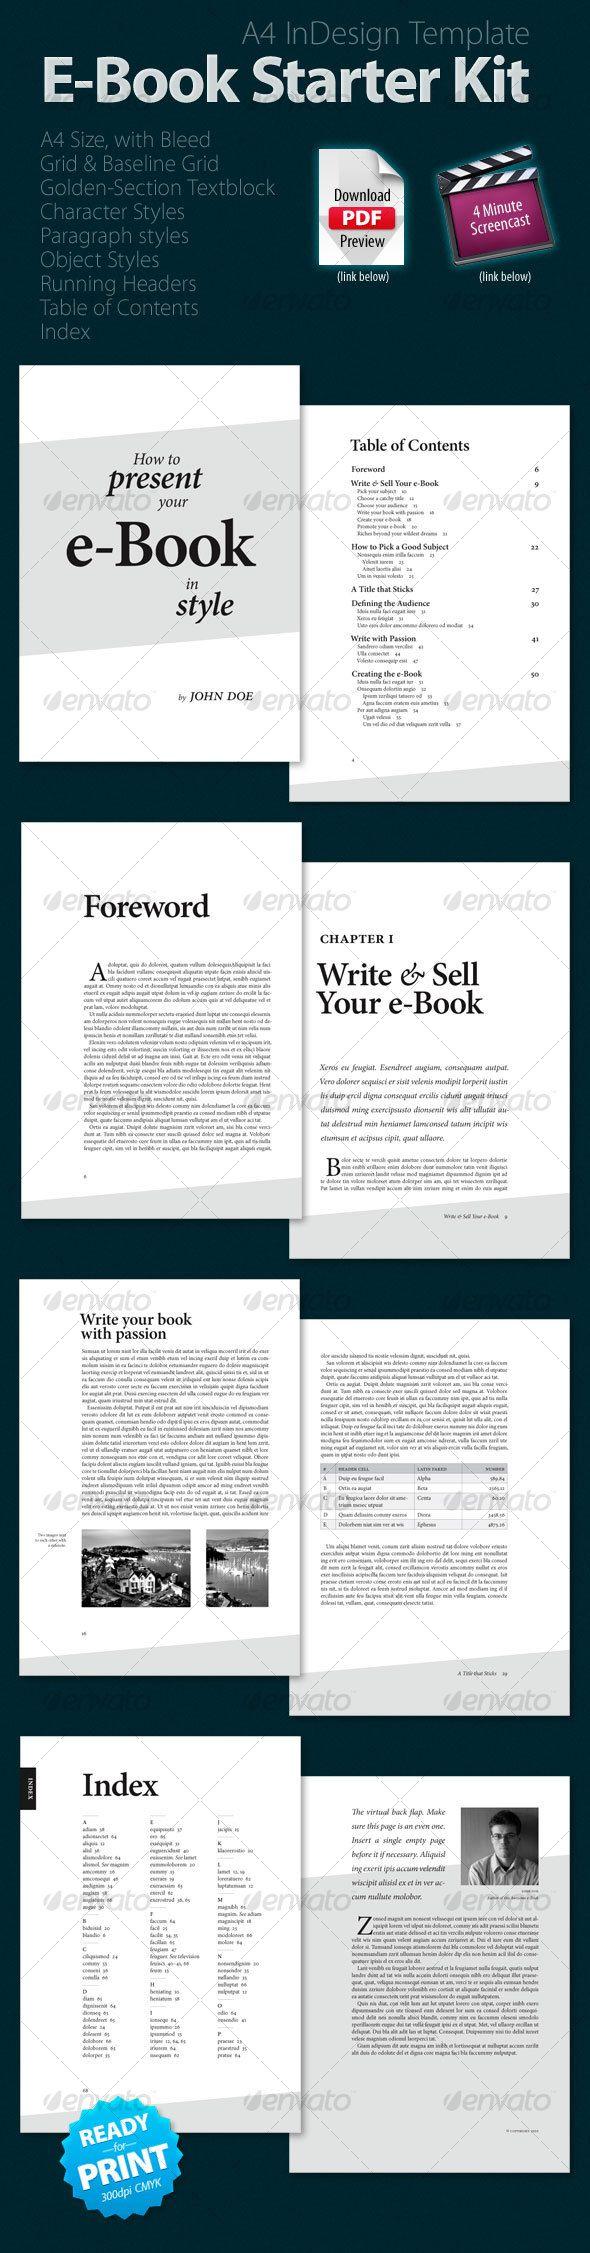 45 best Random Print Templates images on Pinterest | Print templates ...